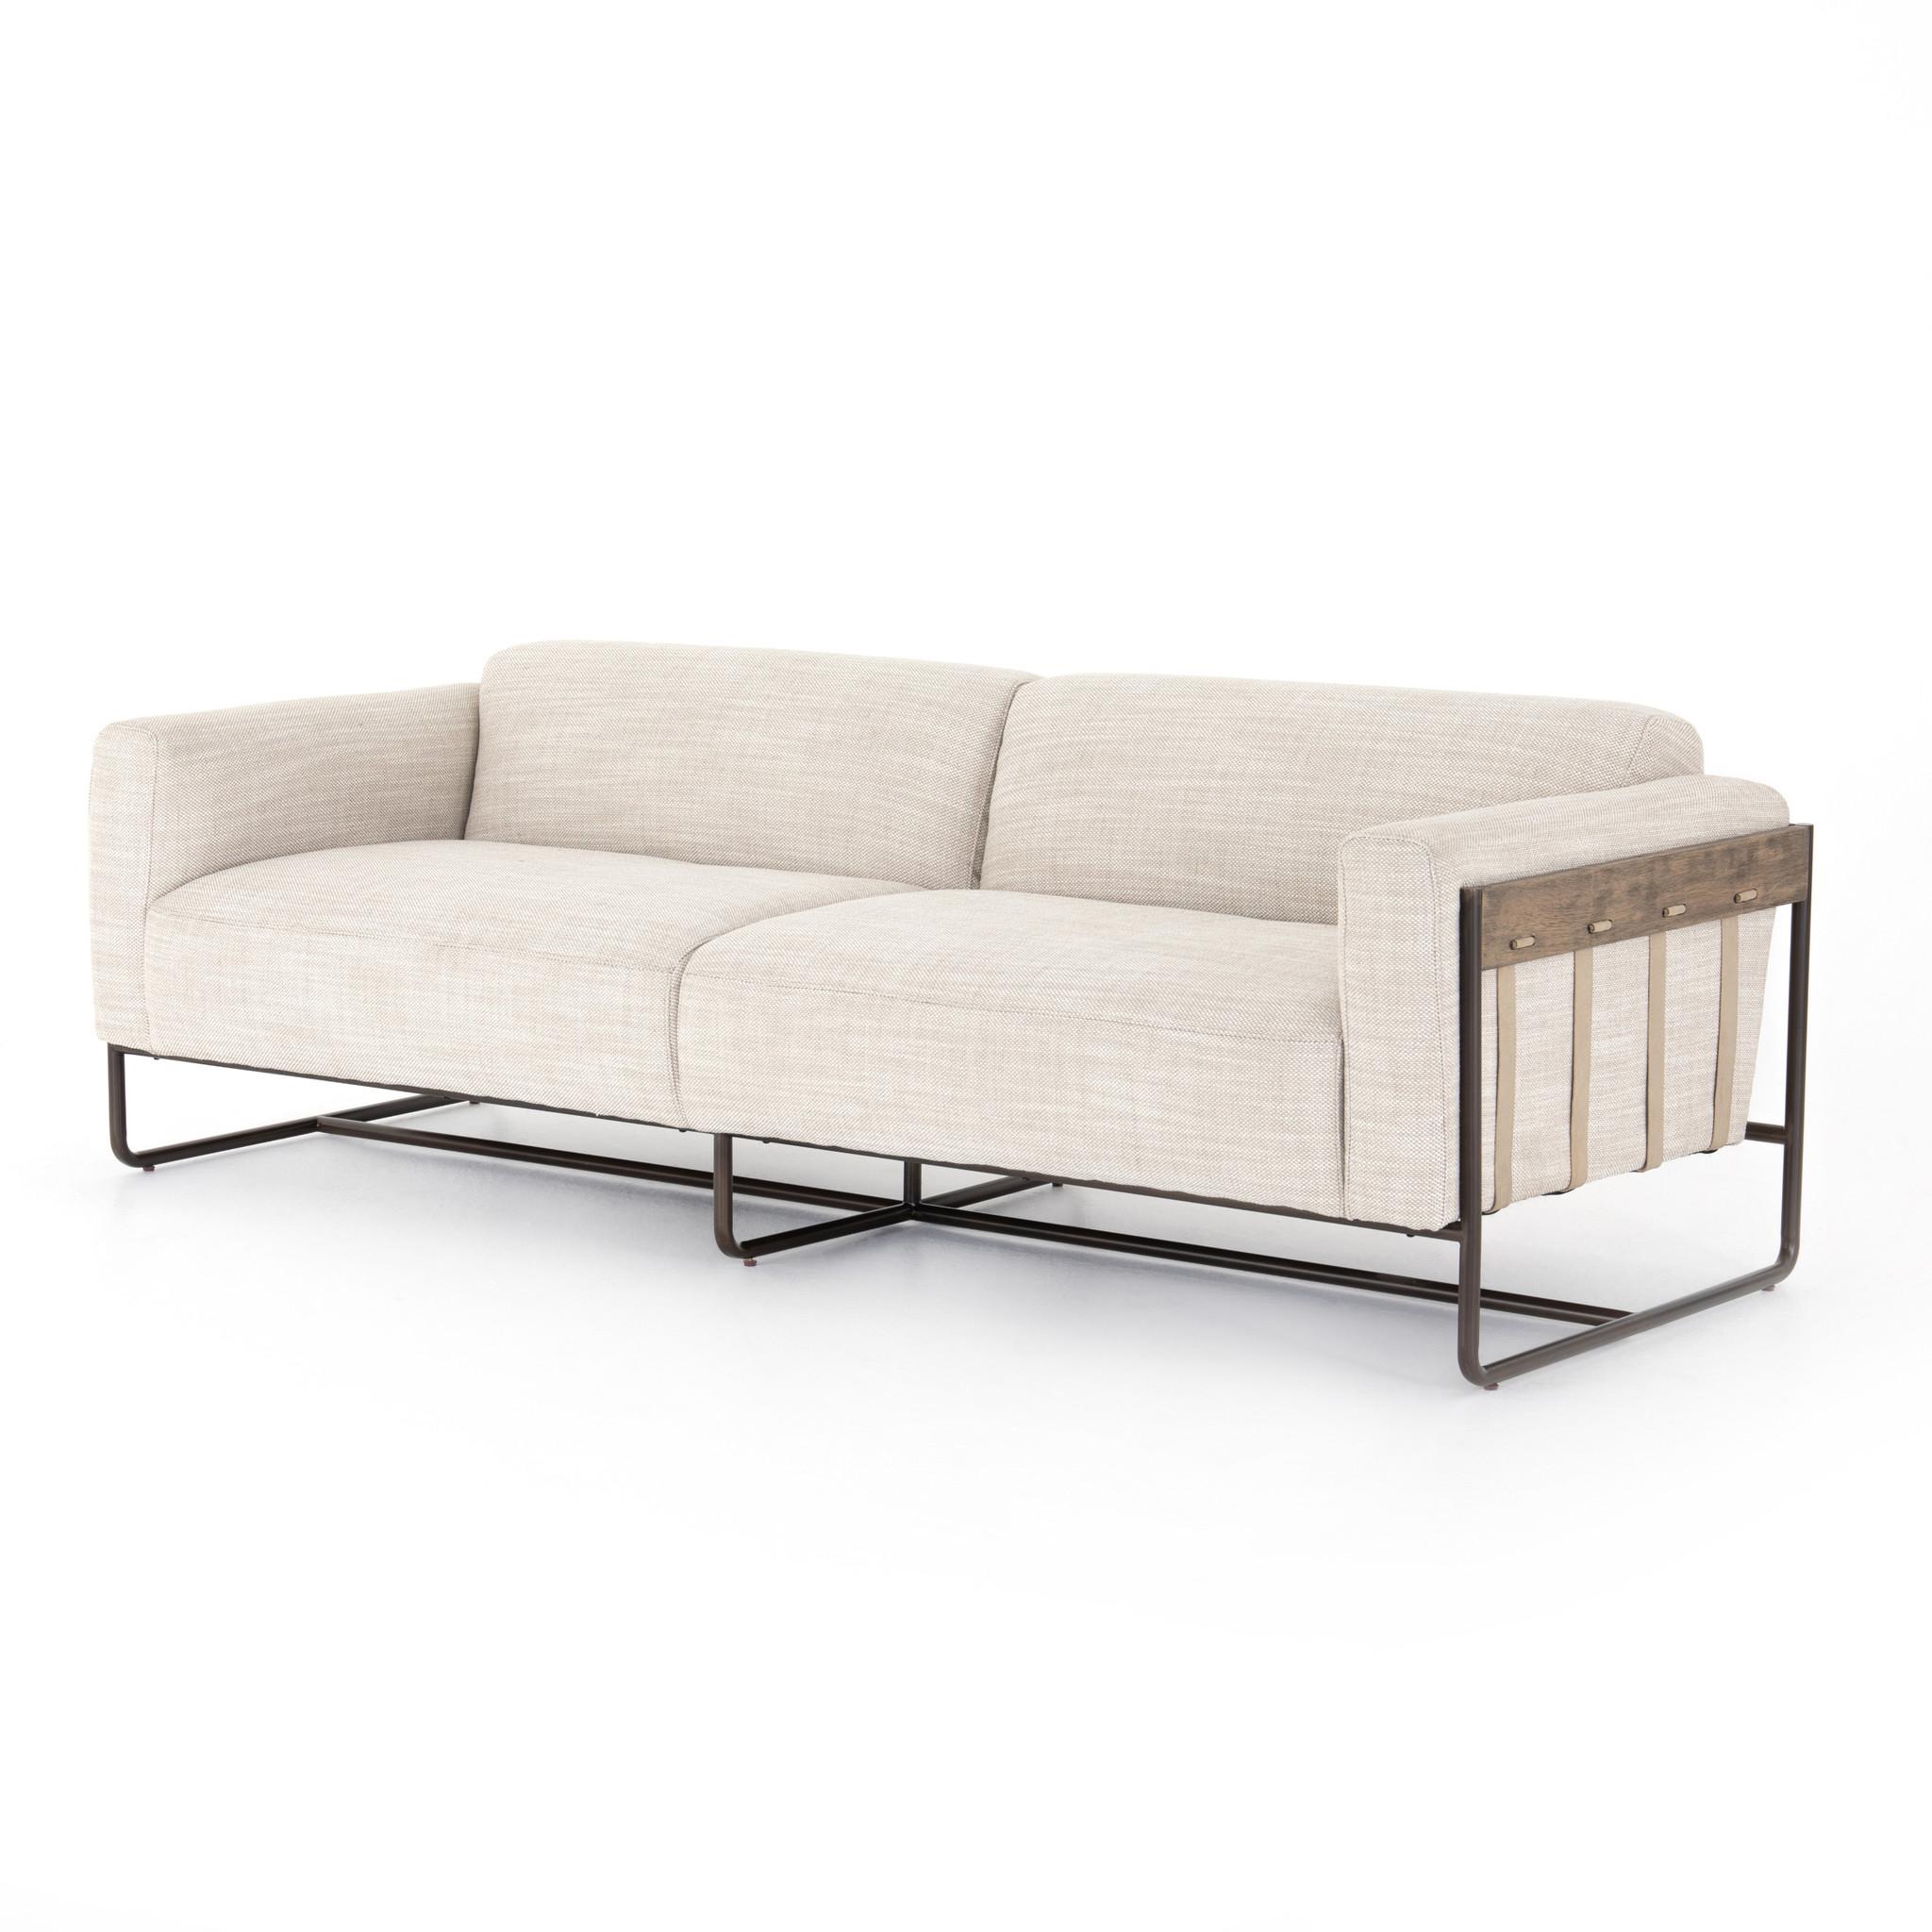 Kolbey Sofa